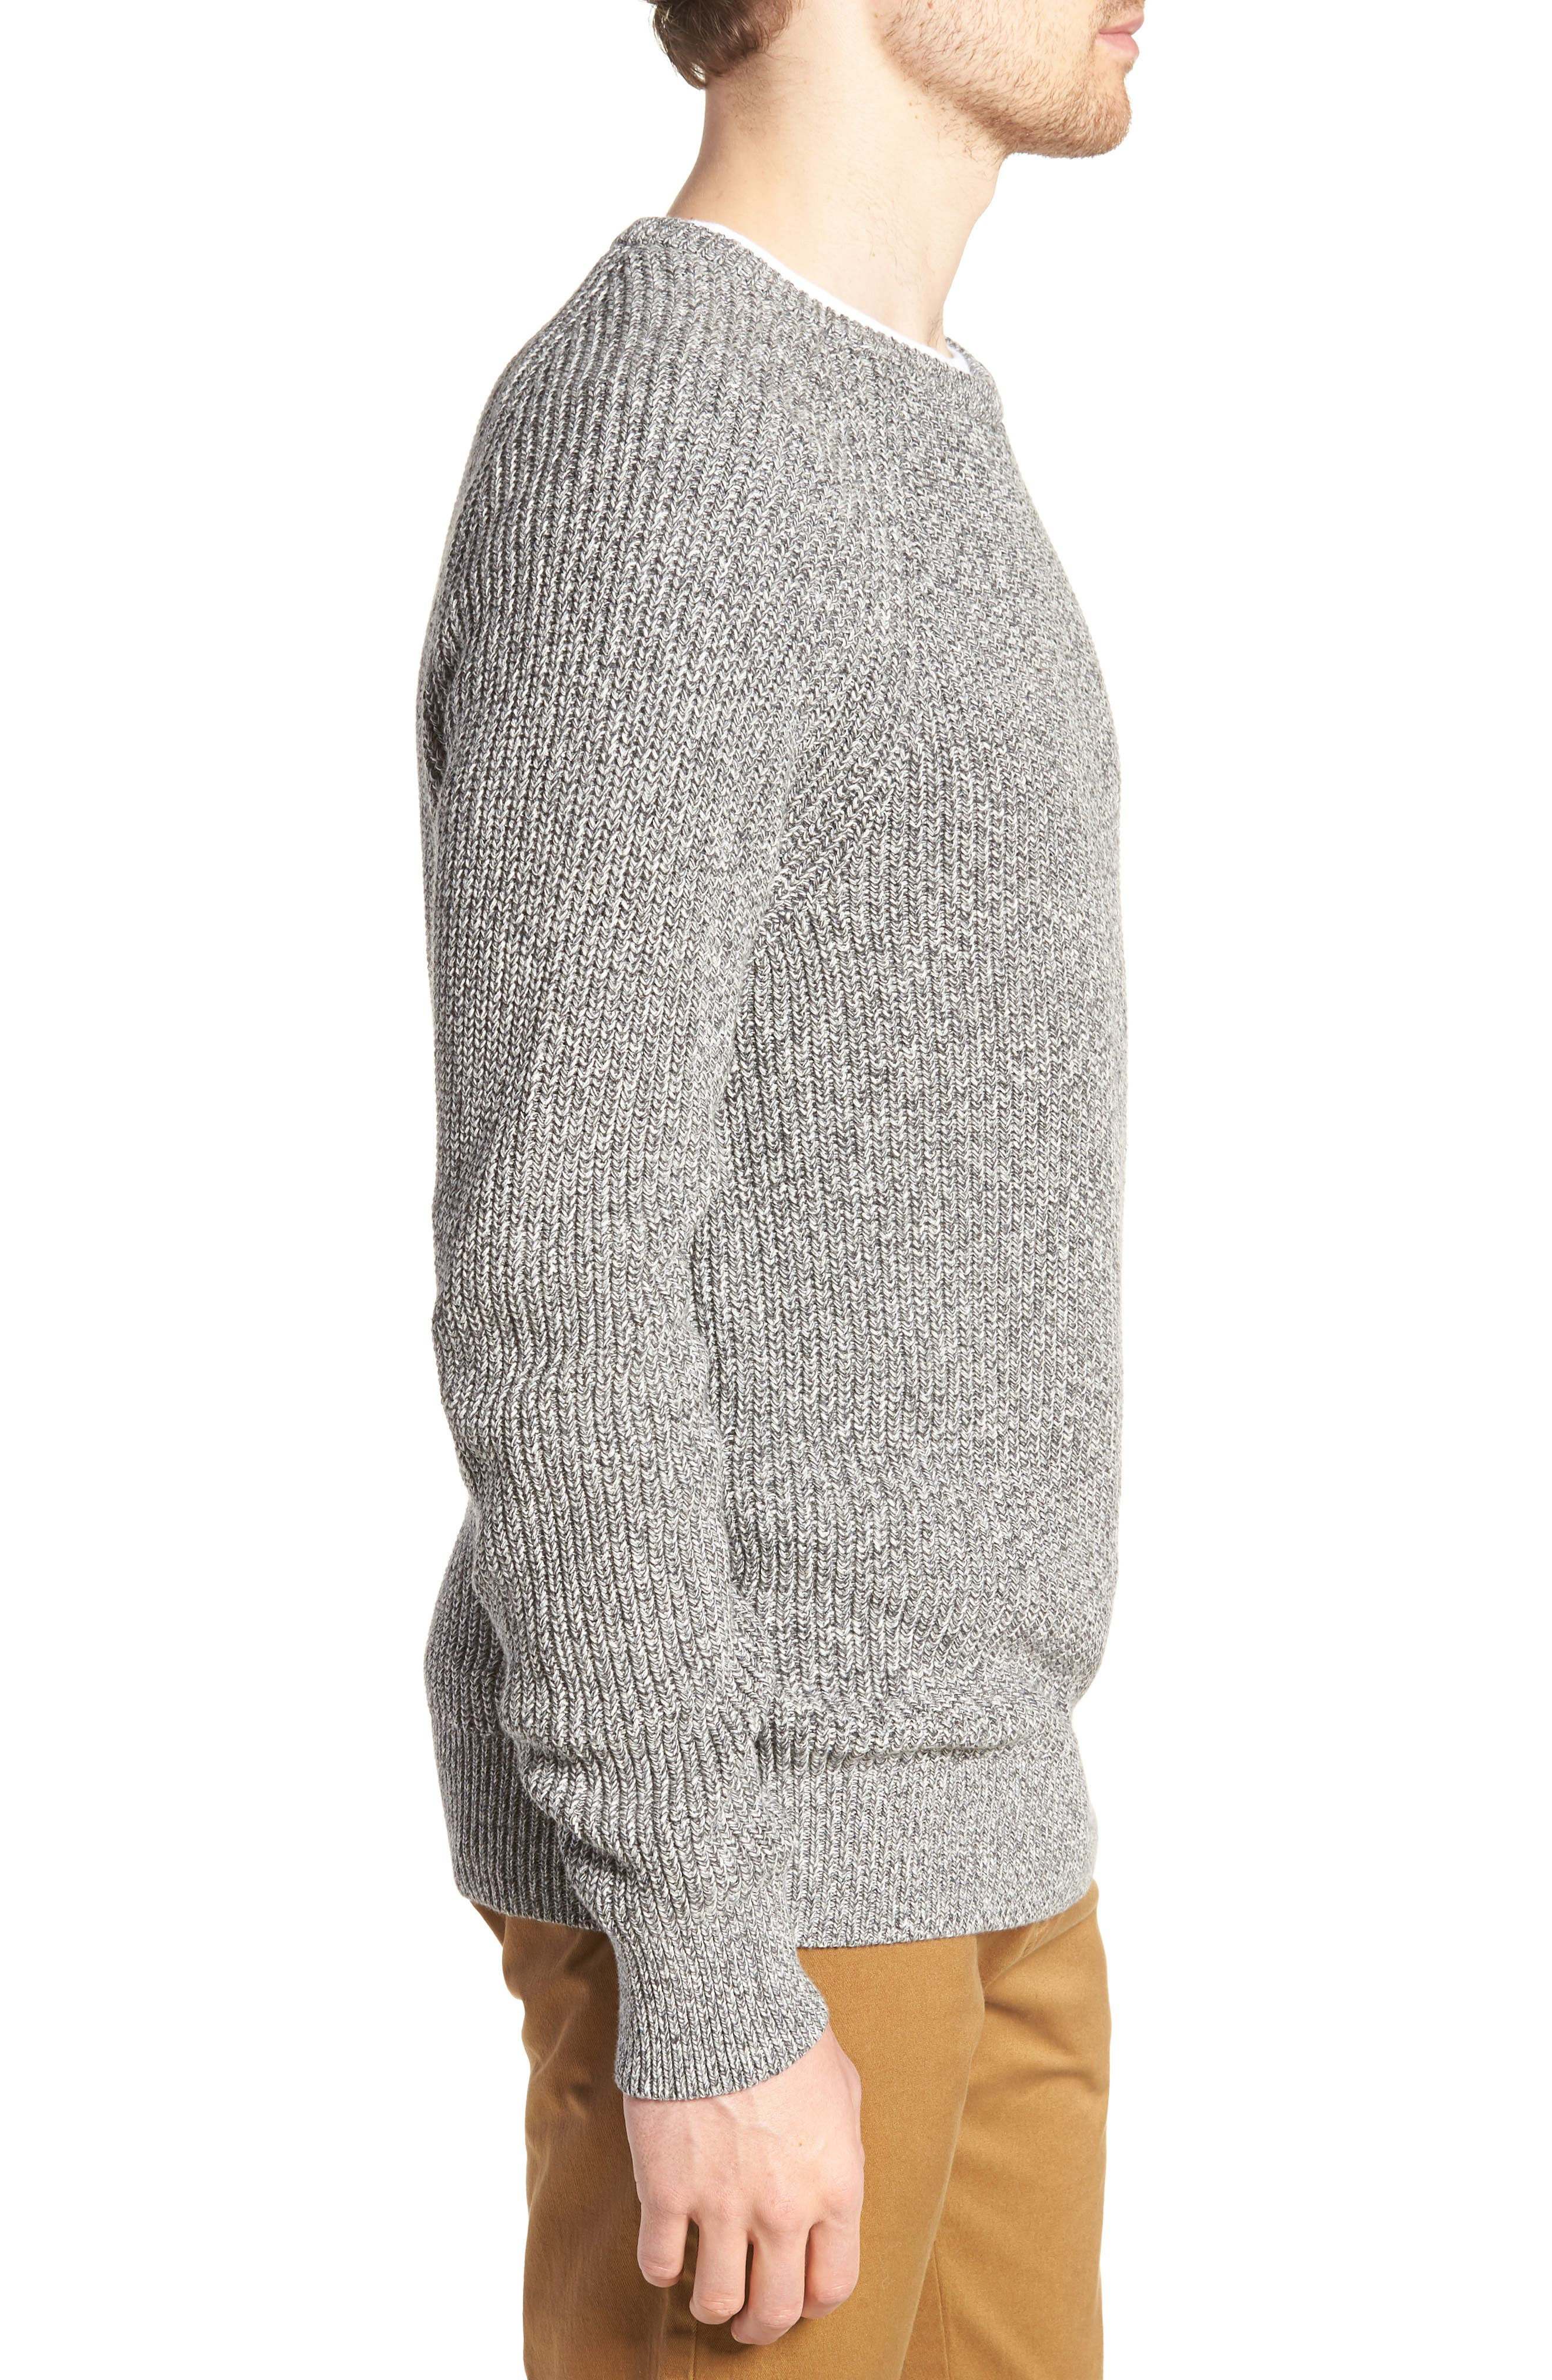 Marled Cotton Crewneck Sweater,                             Alternate thumbnail 3, color,                             020